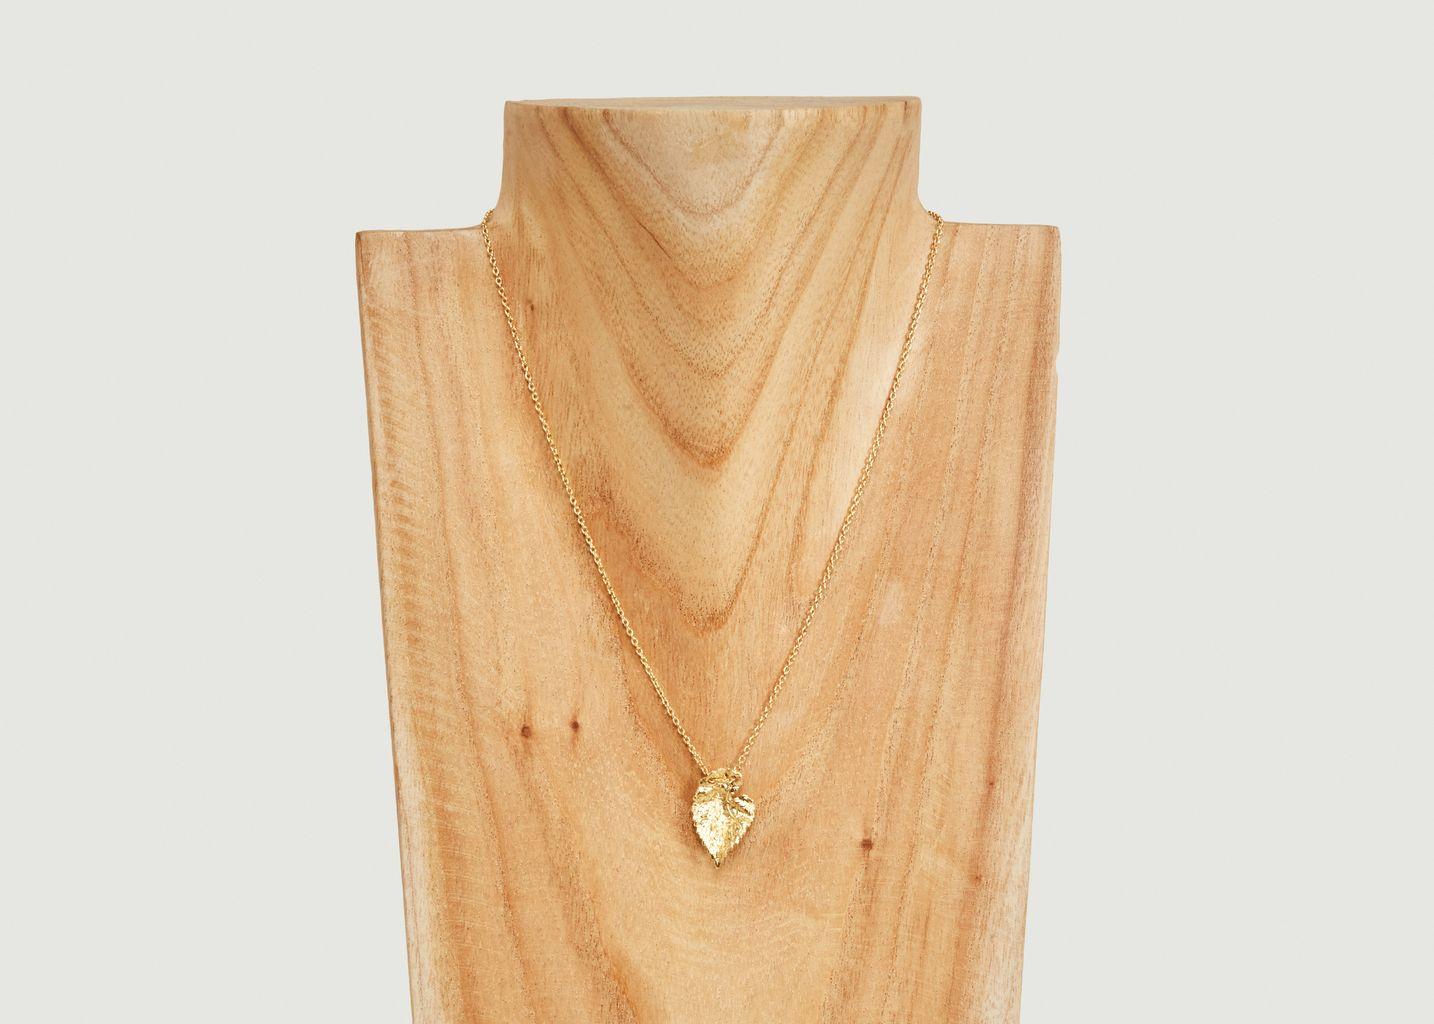 Collier pendentif feuille Vitis Small - Medecine Douce